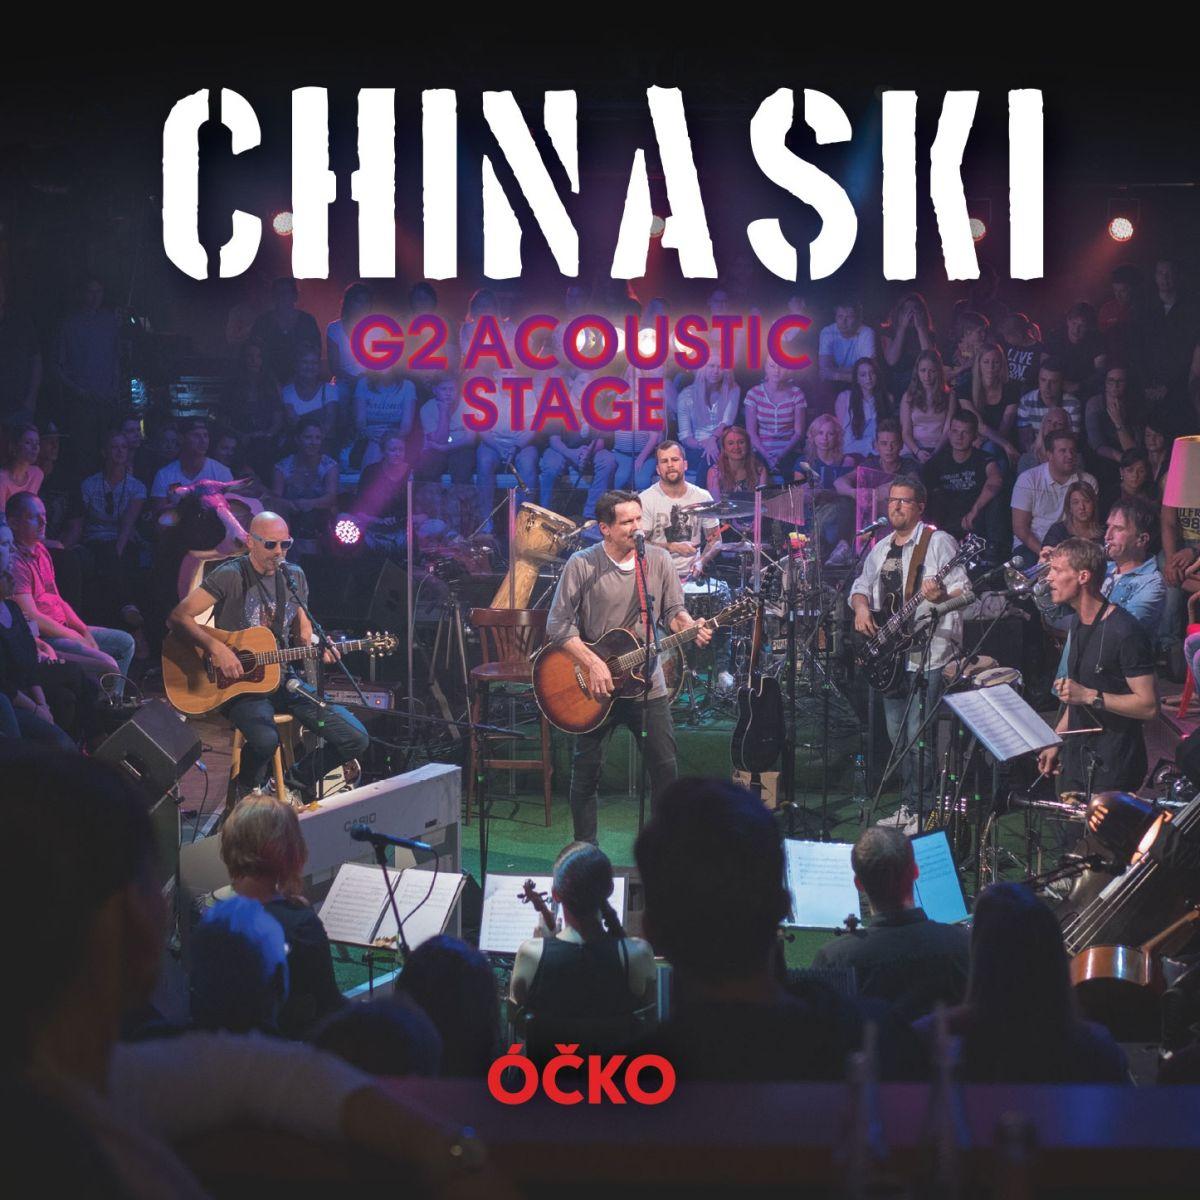 Cd Chinaski - G2 Acoustic Stage ☆ SUPERSHOP ☆ tvoj obchod ☆ cd ... ce2e5b33121